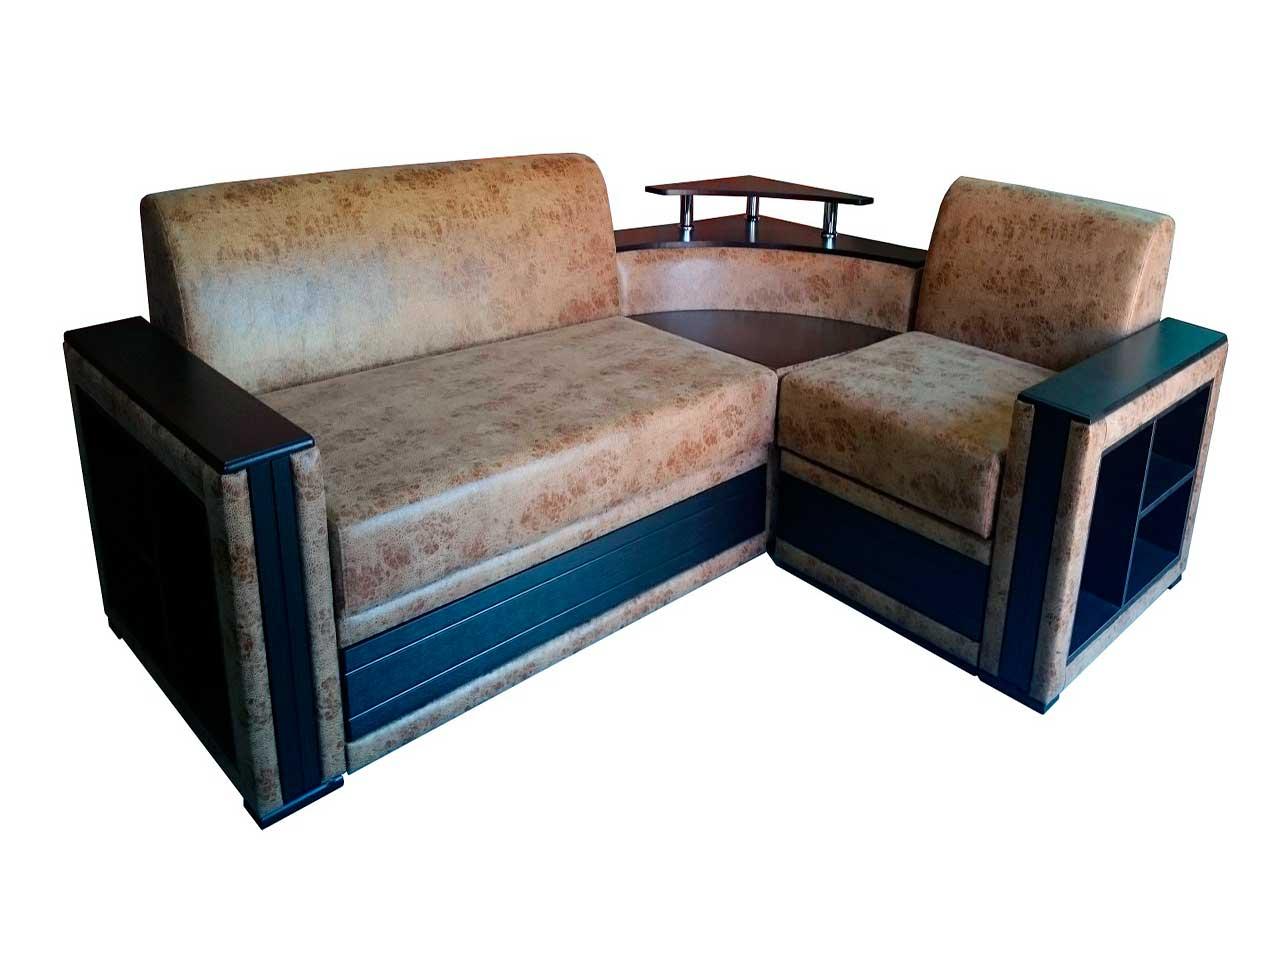 Estilos de sof s la mansi n de las ideas - Mejor sofa cama ...